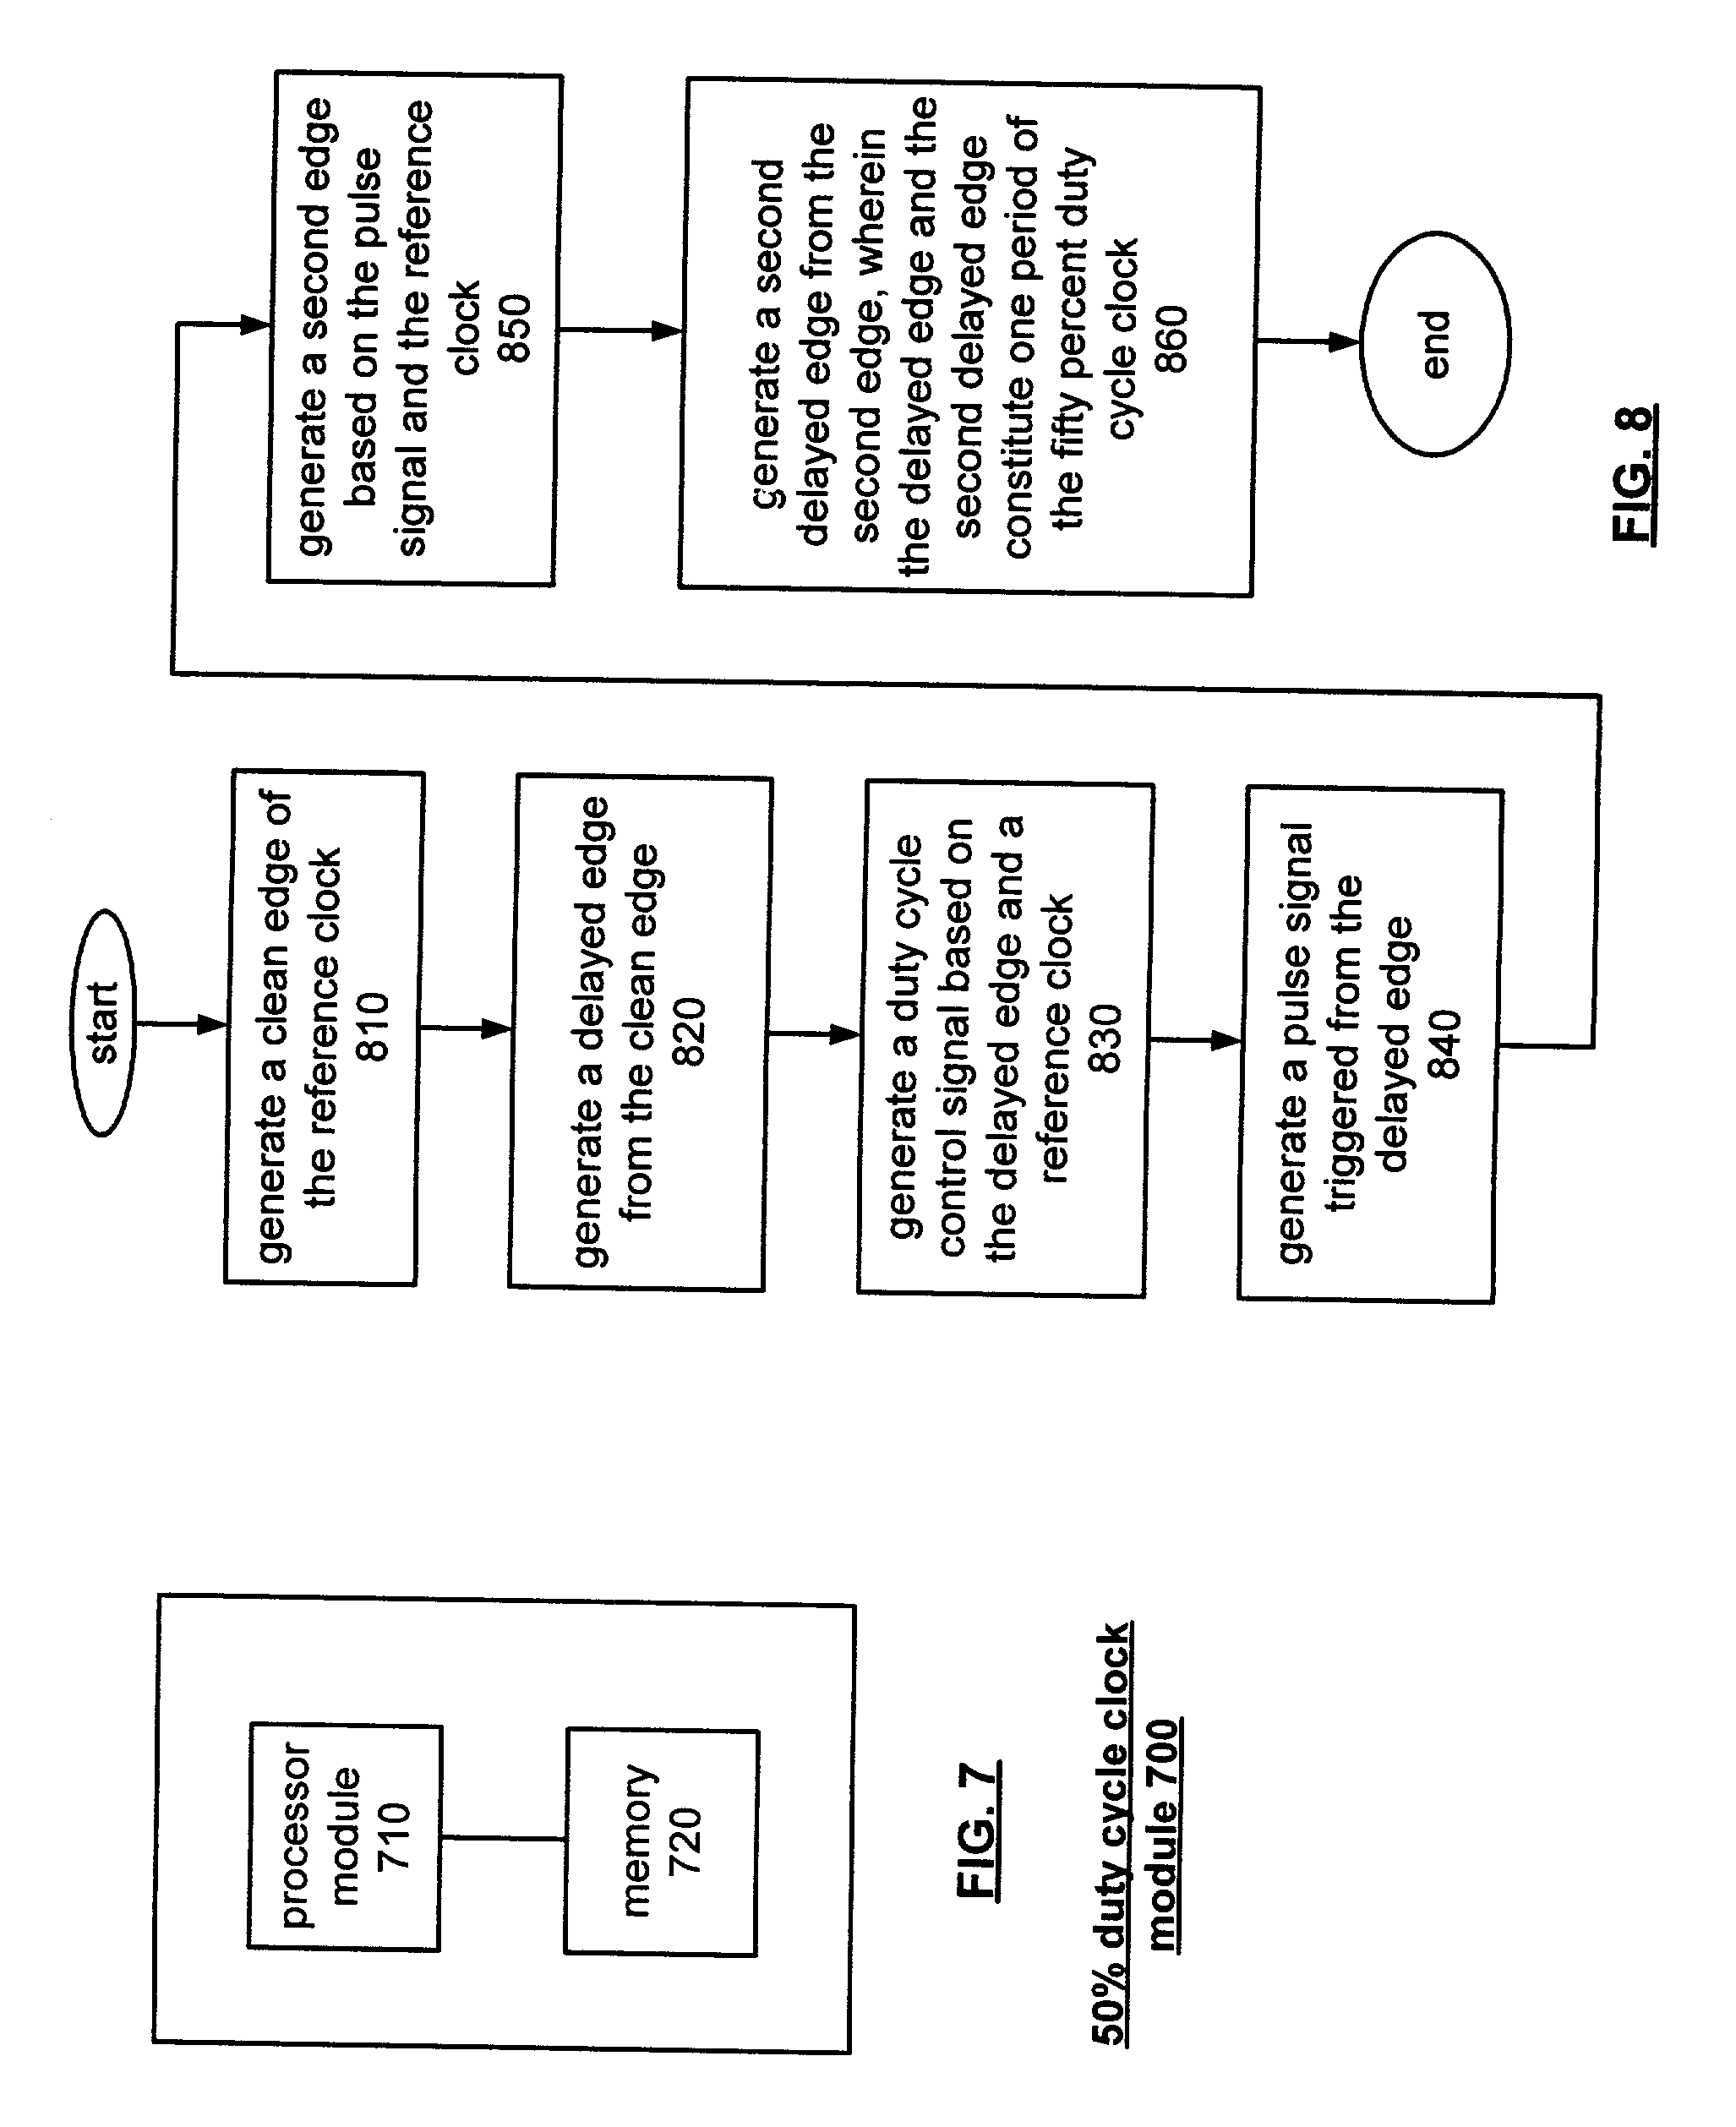 patent us6990143 - 50  duty-cycle clock generator